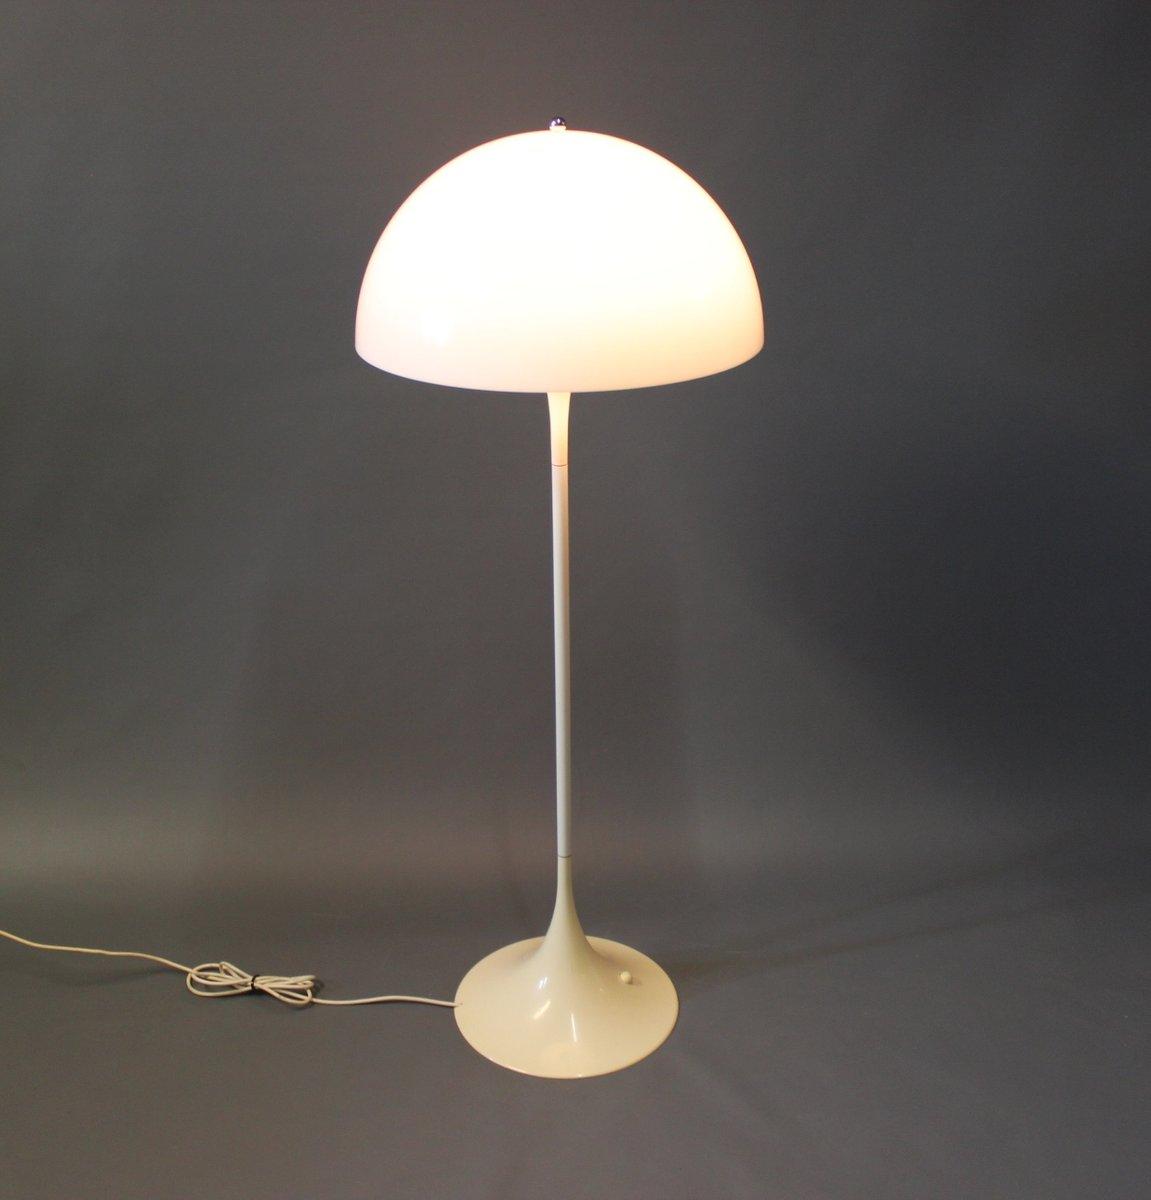 danish panthella floor lamp by verner panton for louis poulsen 1970s for sale at pamono. Black Bedroom Furniture Sets. Home Design Ideas